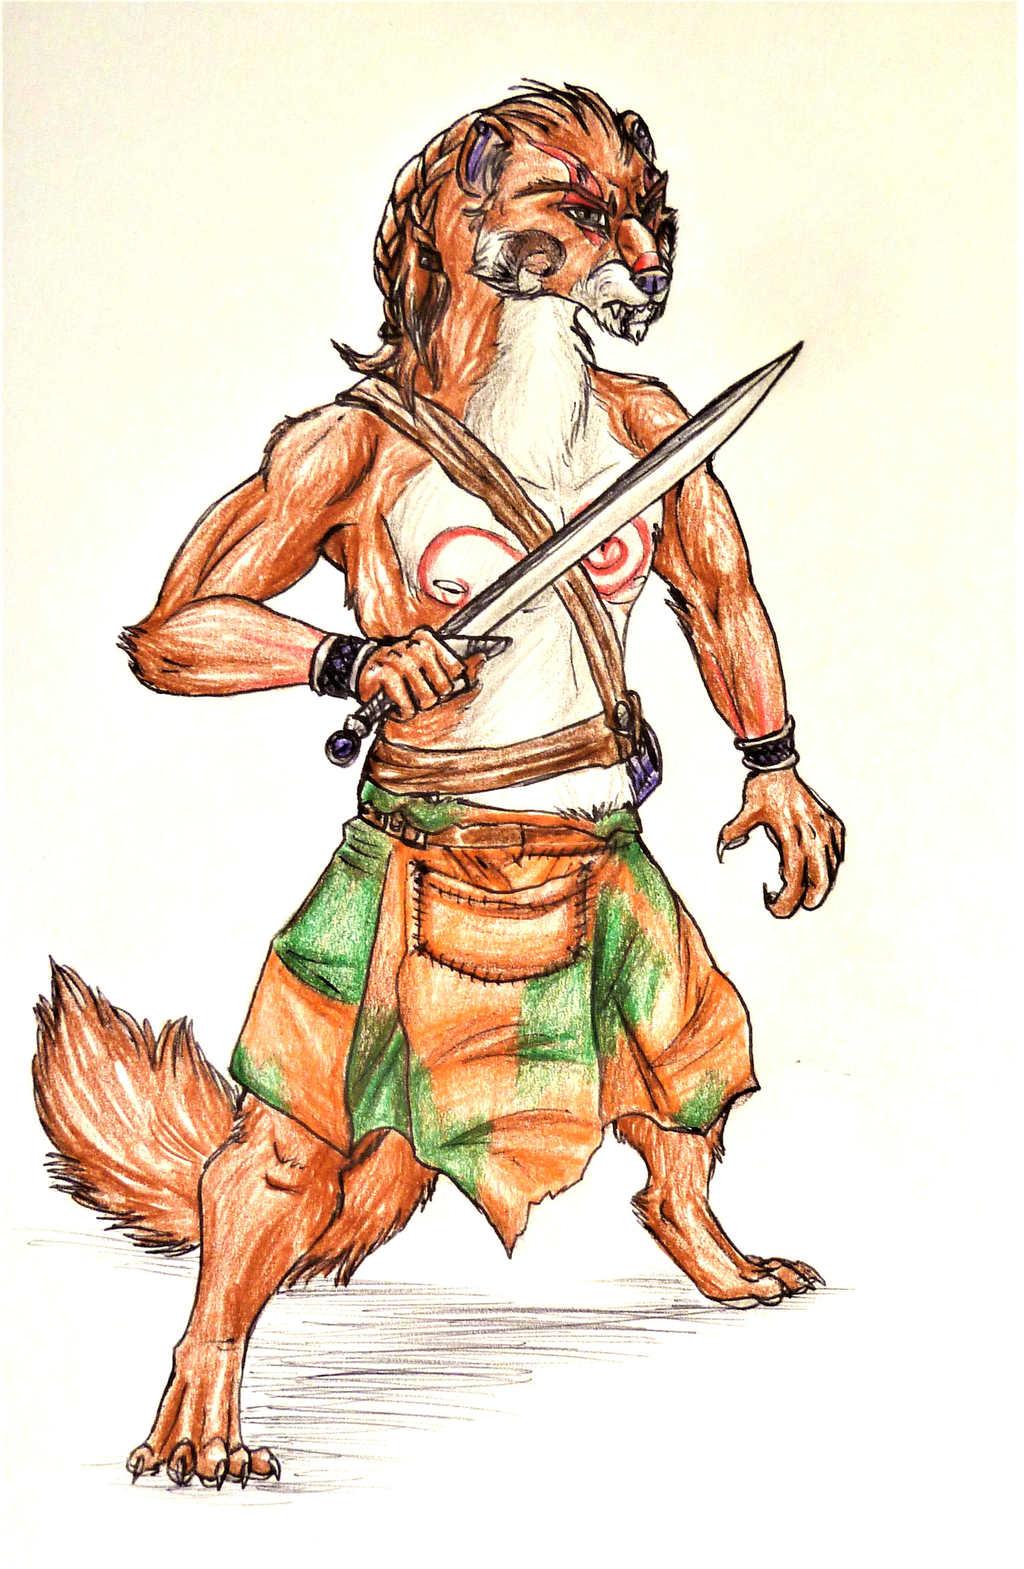 Dankwood, Son of Sorghum the Slayer